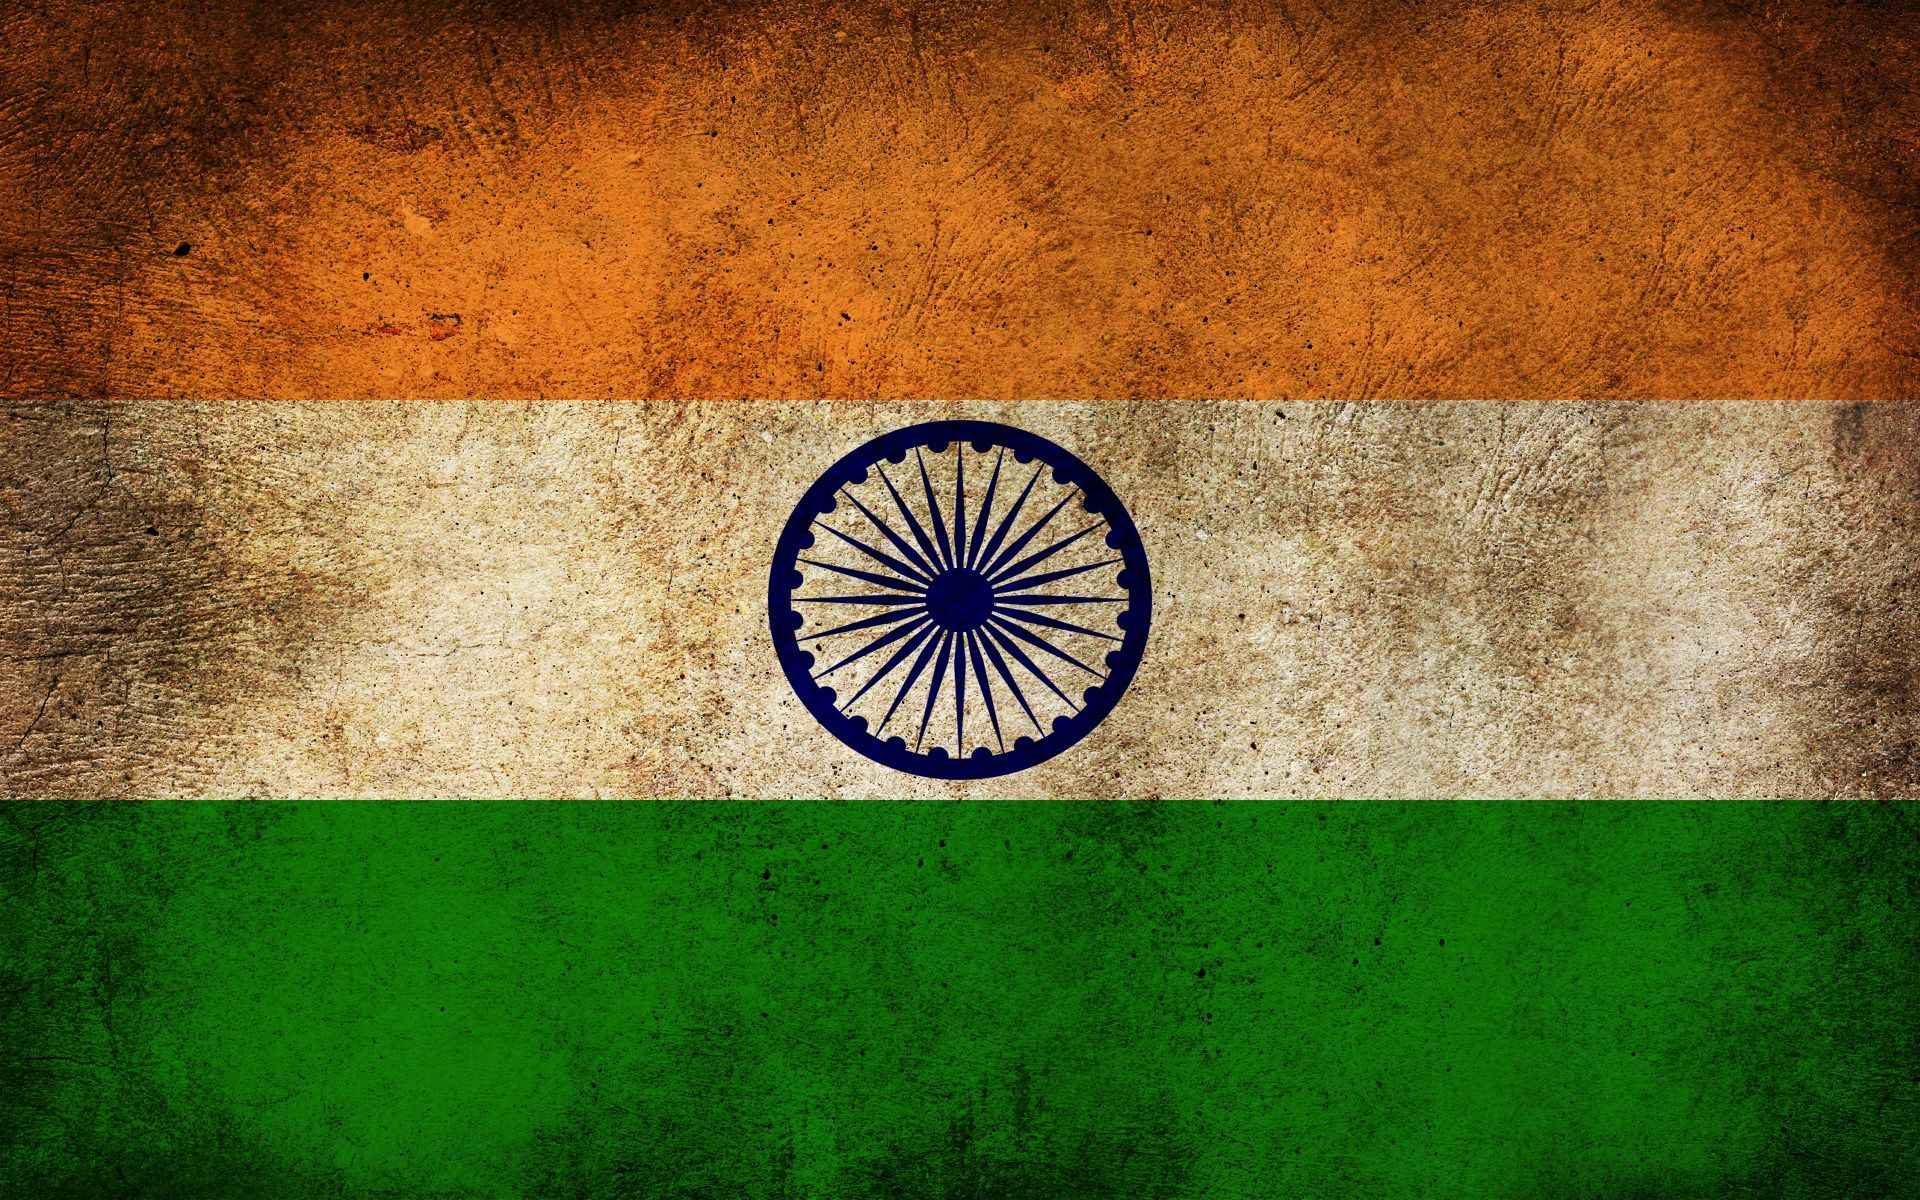 Indian Flag Wallpaper Free Download Indian Flag Wallpaper Indian Flag Indian Flag Images